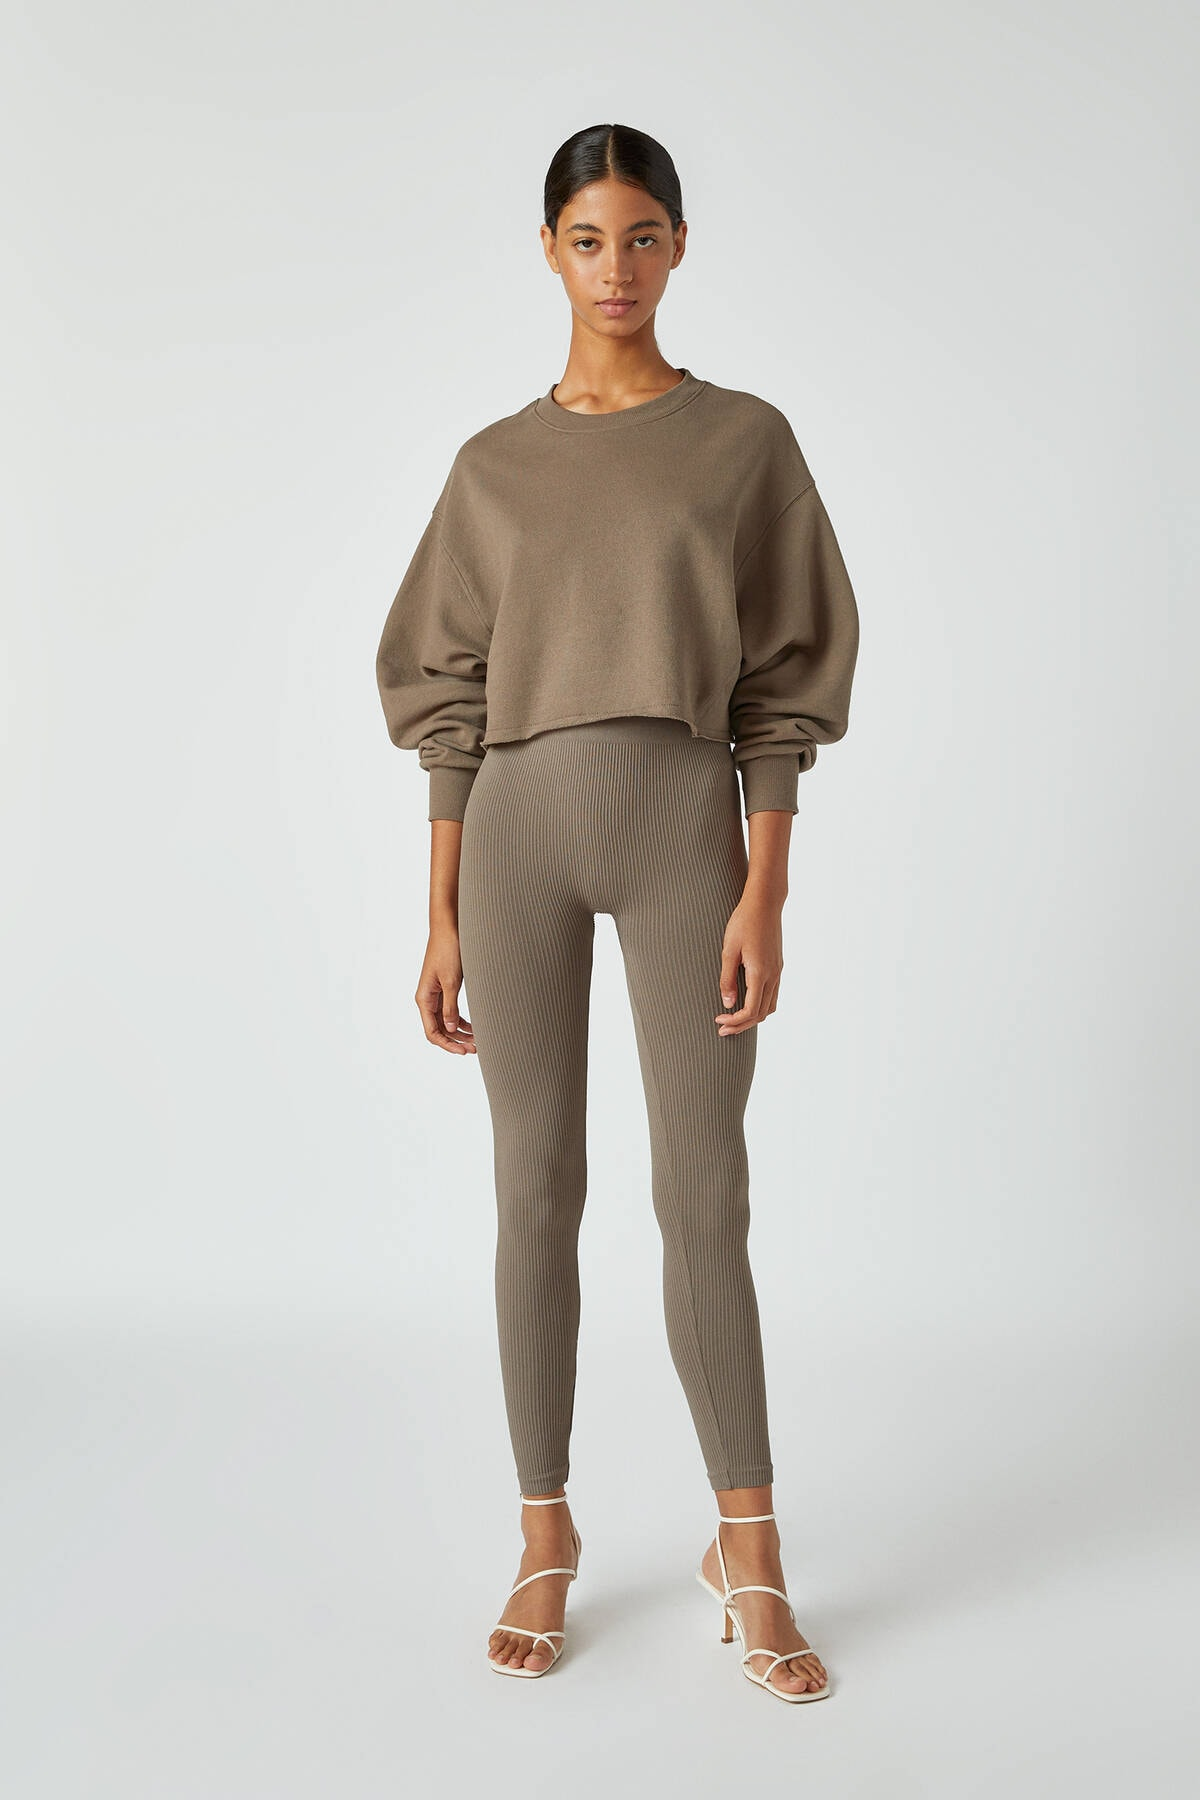 Pull & Bear Kadın Boz Gri Rahat Crop Fit Sweatshirt 09594315 1